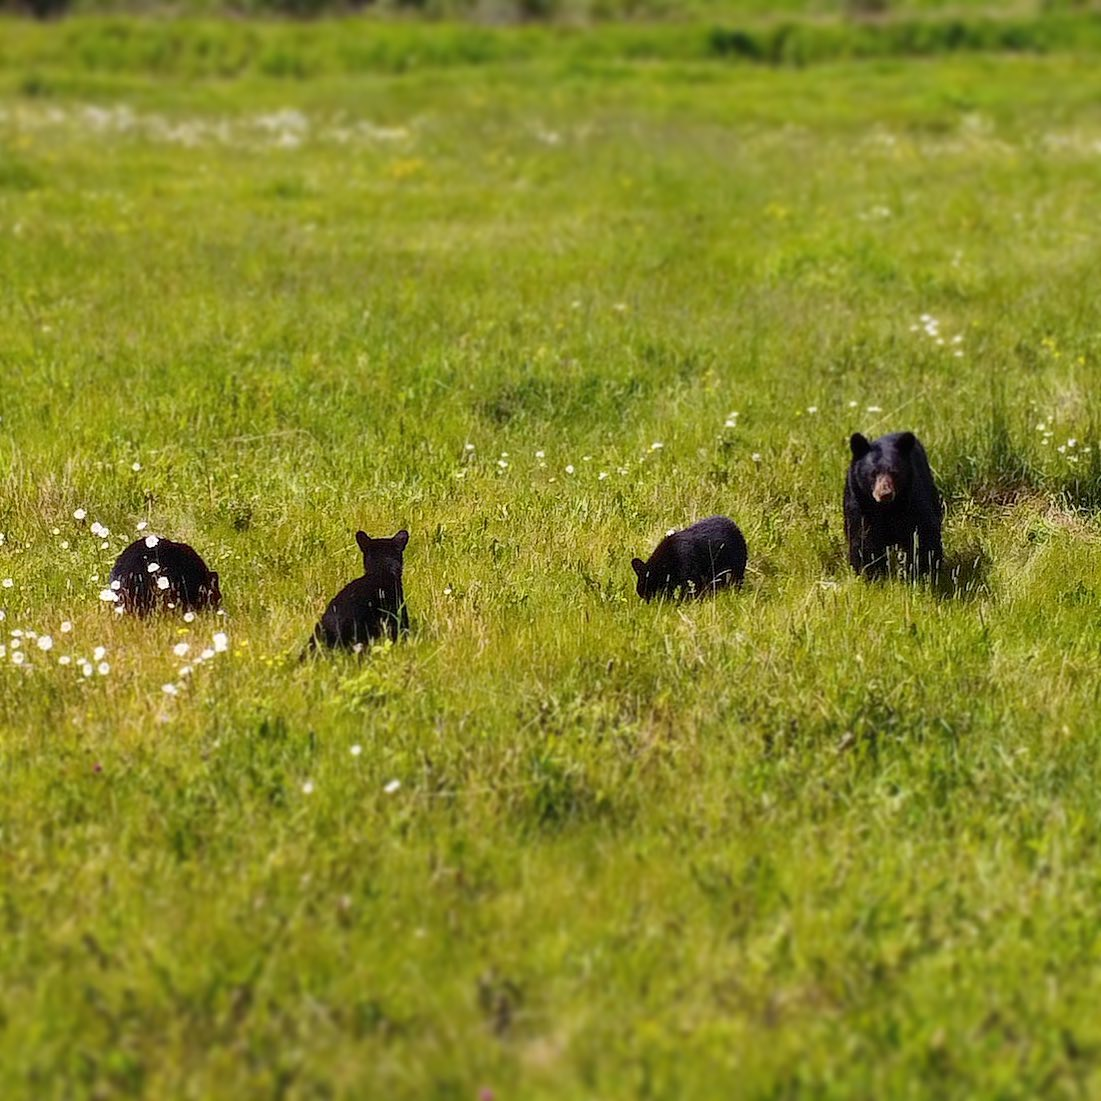 Black bear and 3 cubs near Topley, BC.